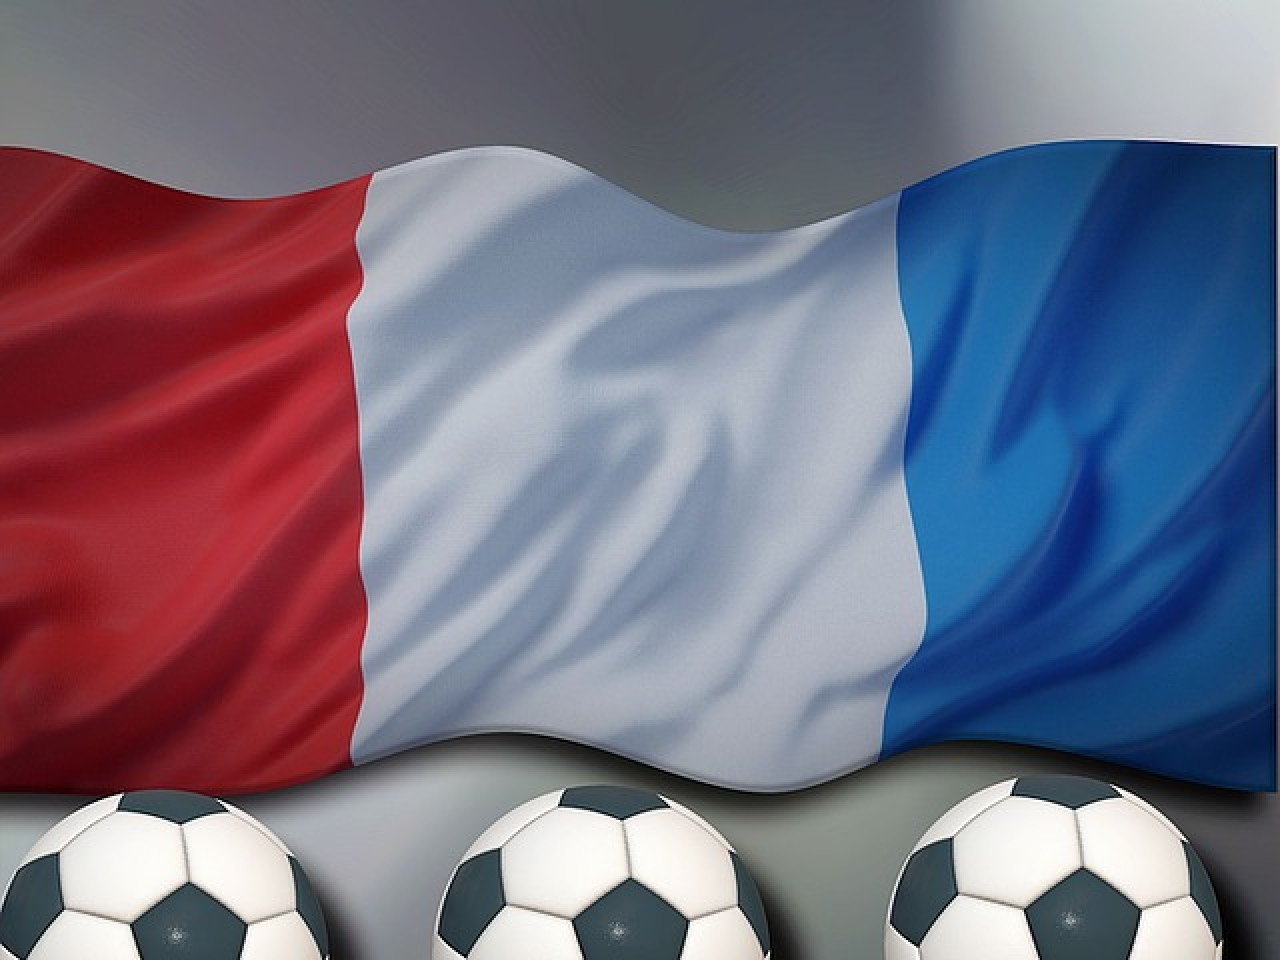 Paris Saint Germain Hotel and Match Ticket Breaks